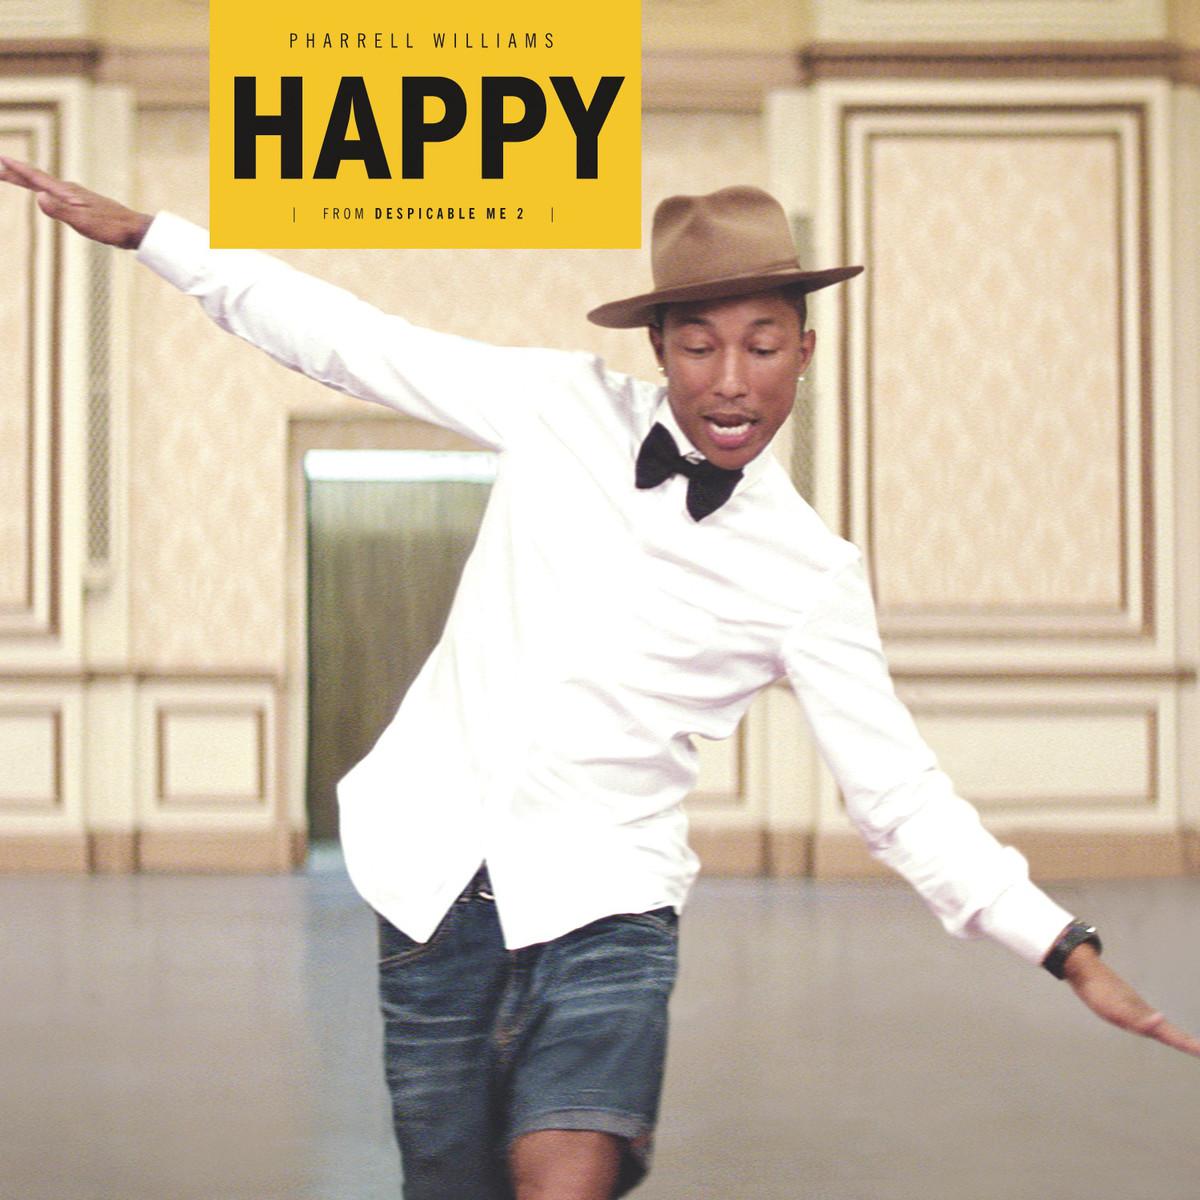 Pharrell-Williams-Happy-2013-1200x1200 (1)